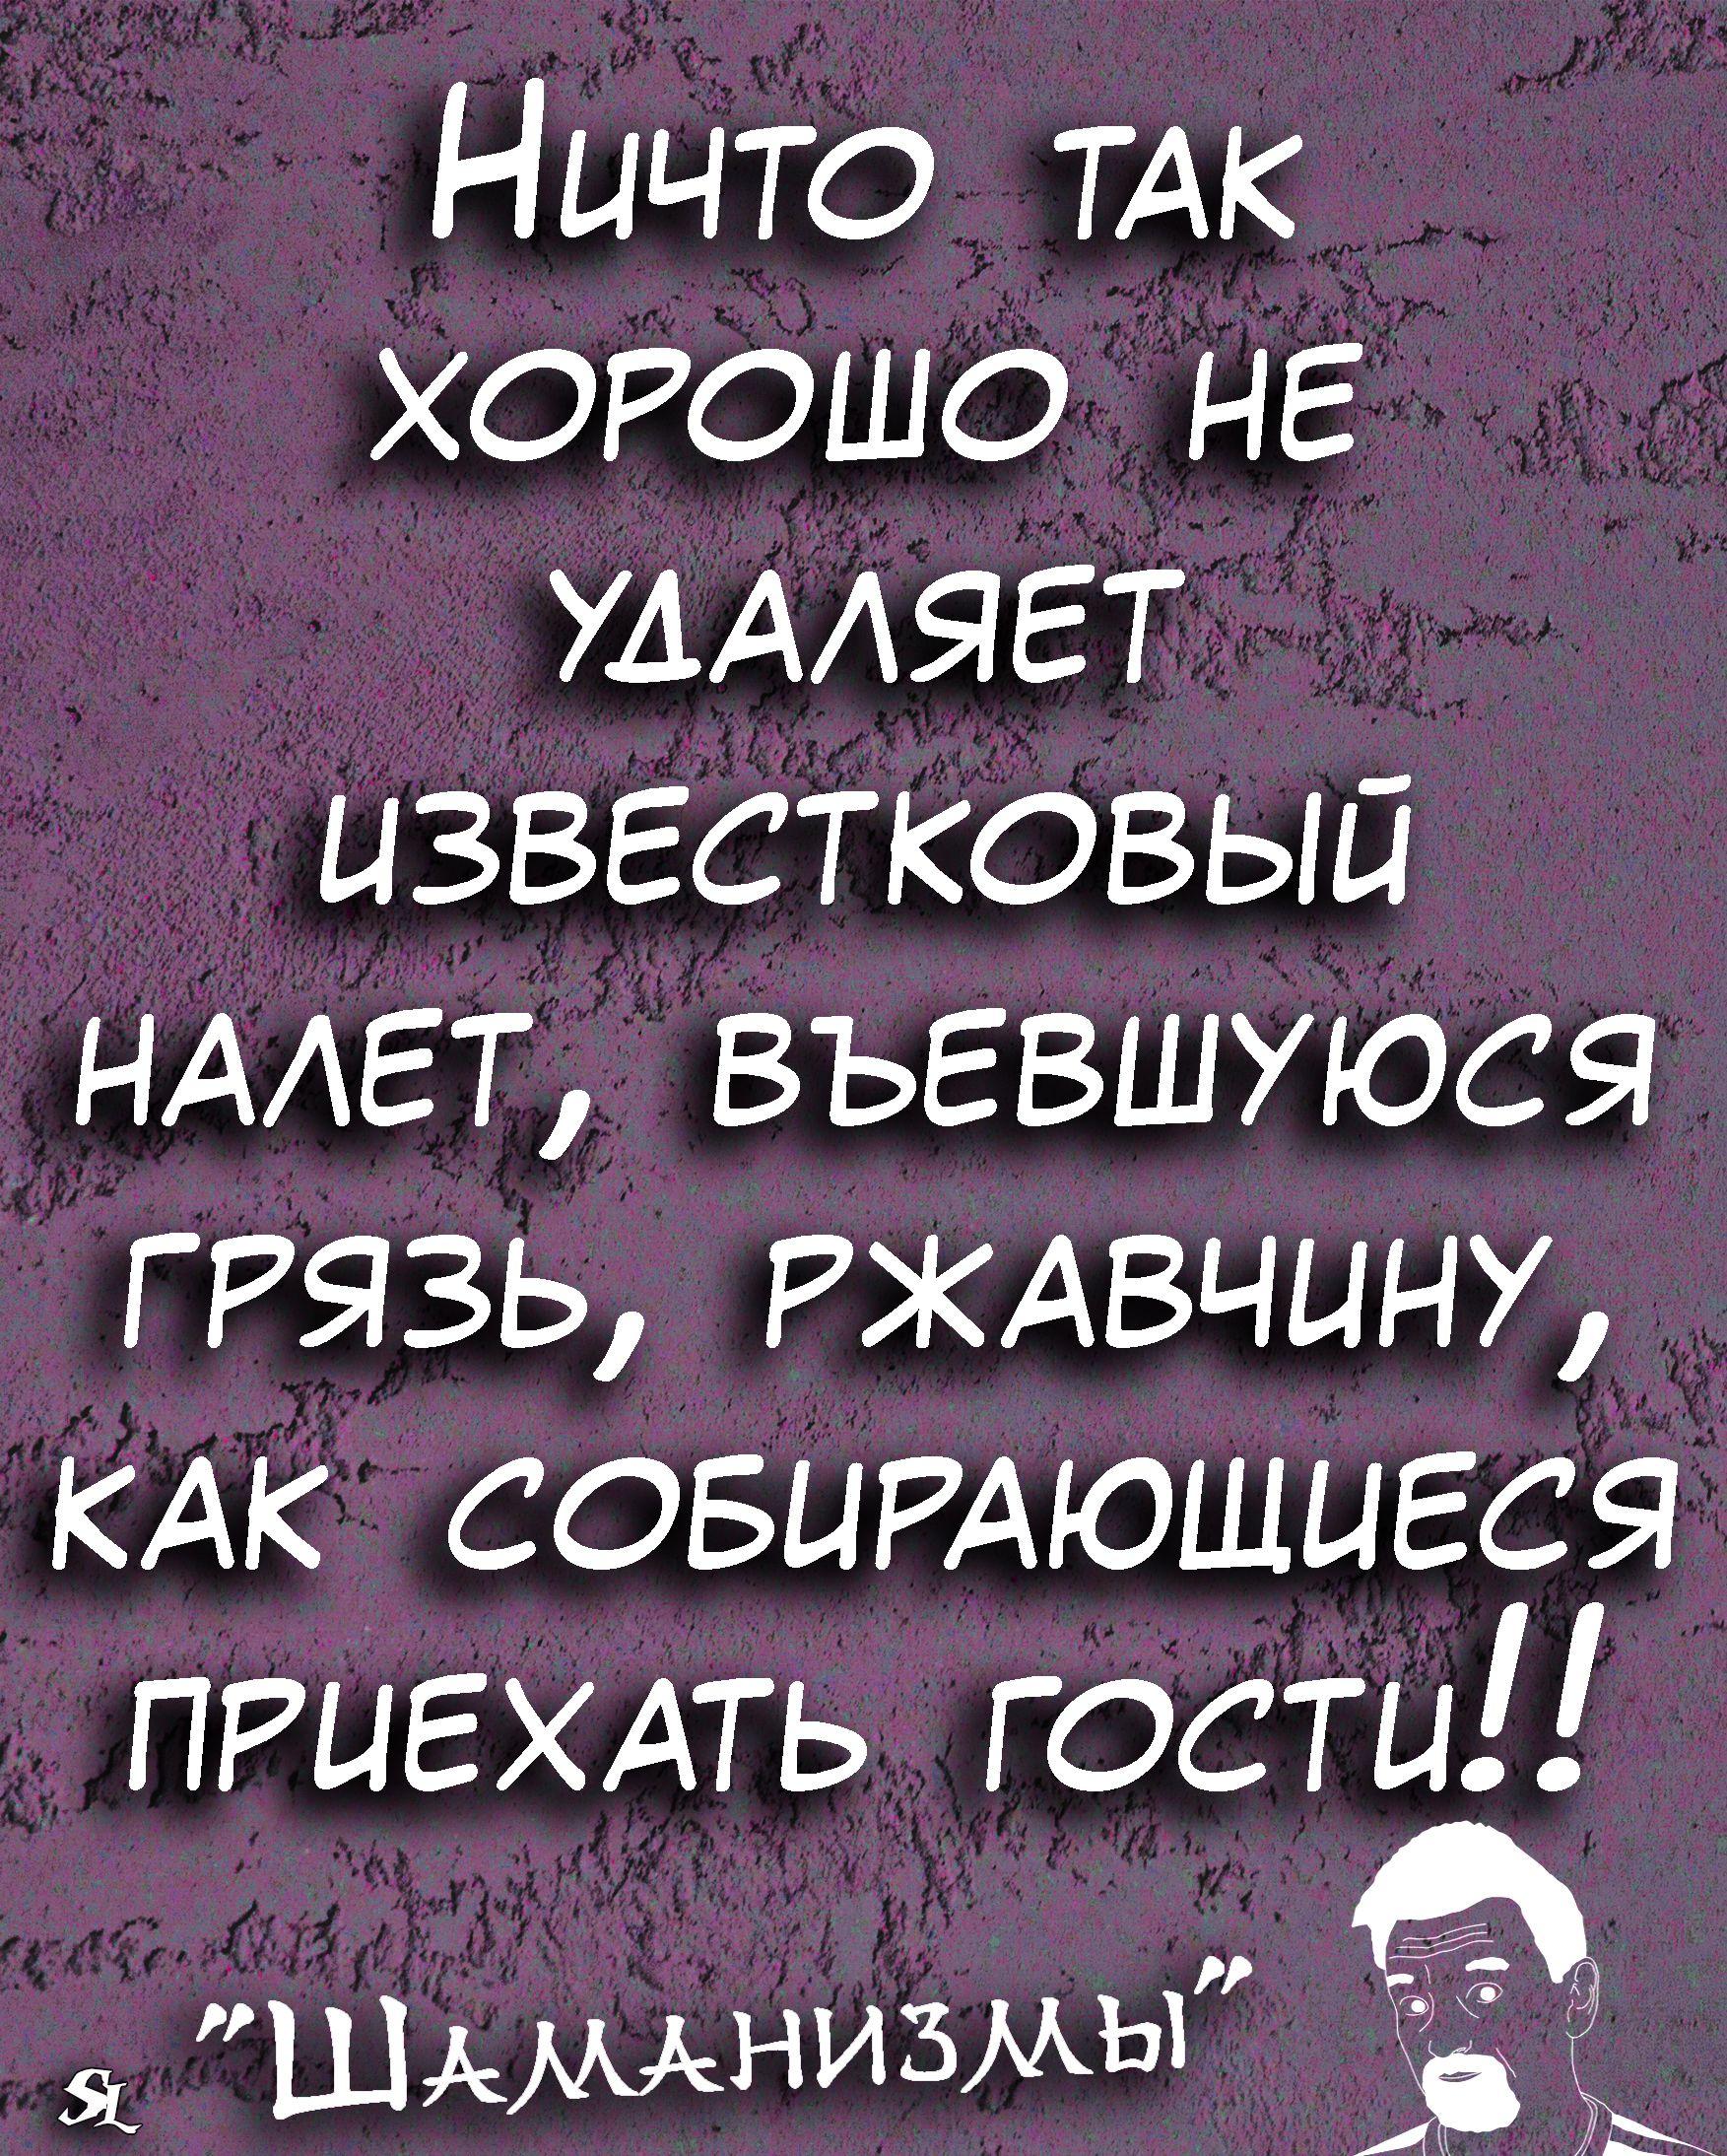 Shamanizmy Shutki Prikol Yumor Jokes Funny Humor Memes Sharing Economy Phrase Of The Day Quotations